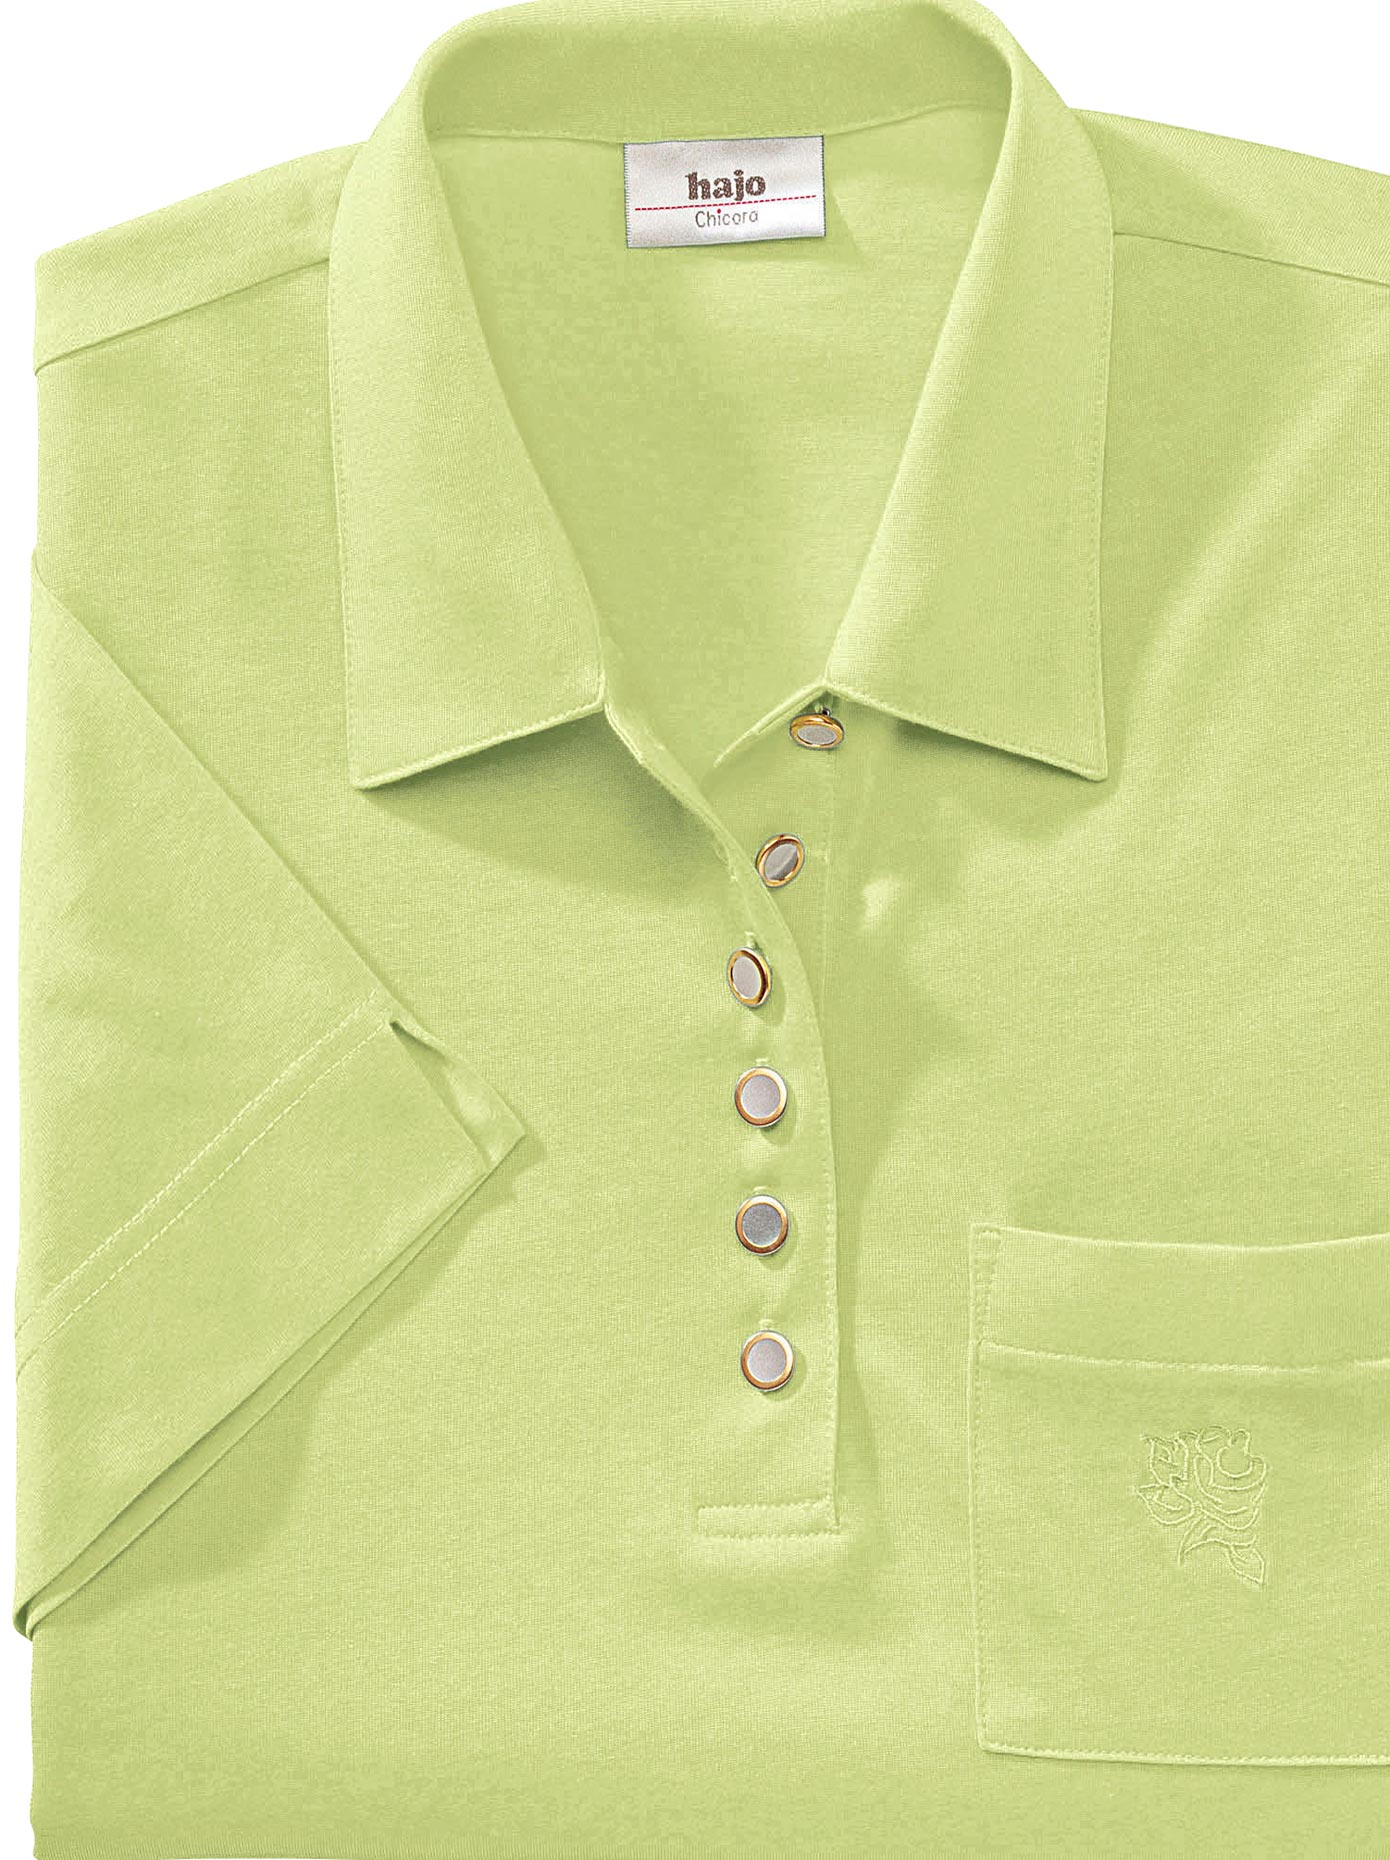 Hajo Poloshirt mit Antipilling-Ausrüstung | Bekleidung > Shirts > Poloshirts | Classic